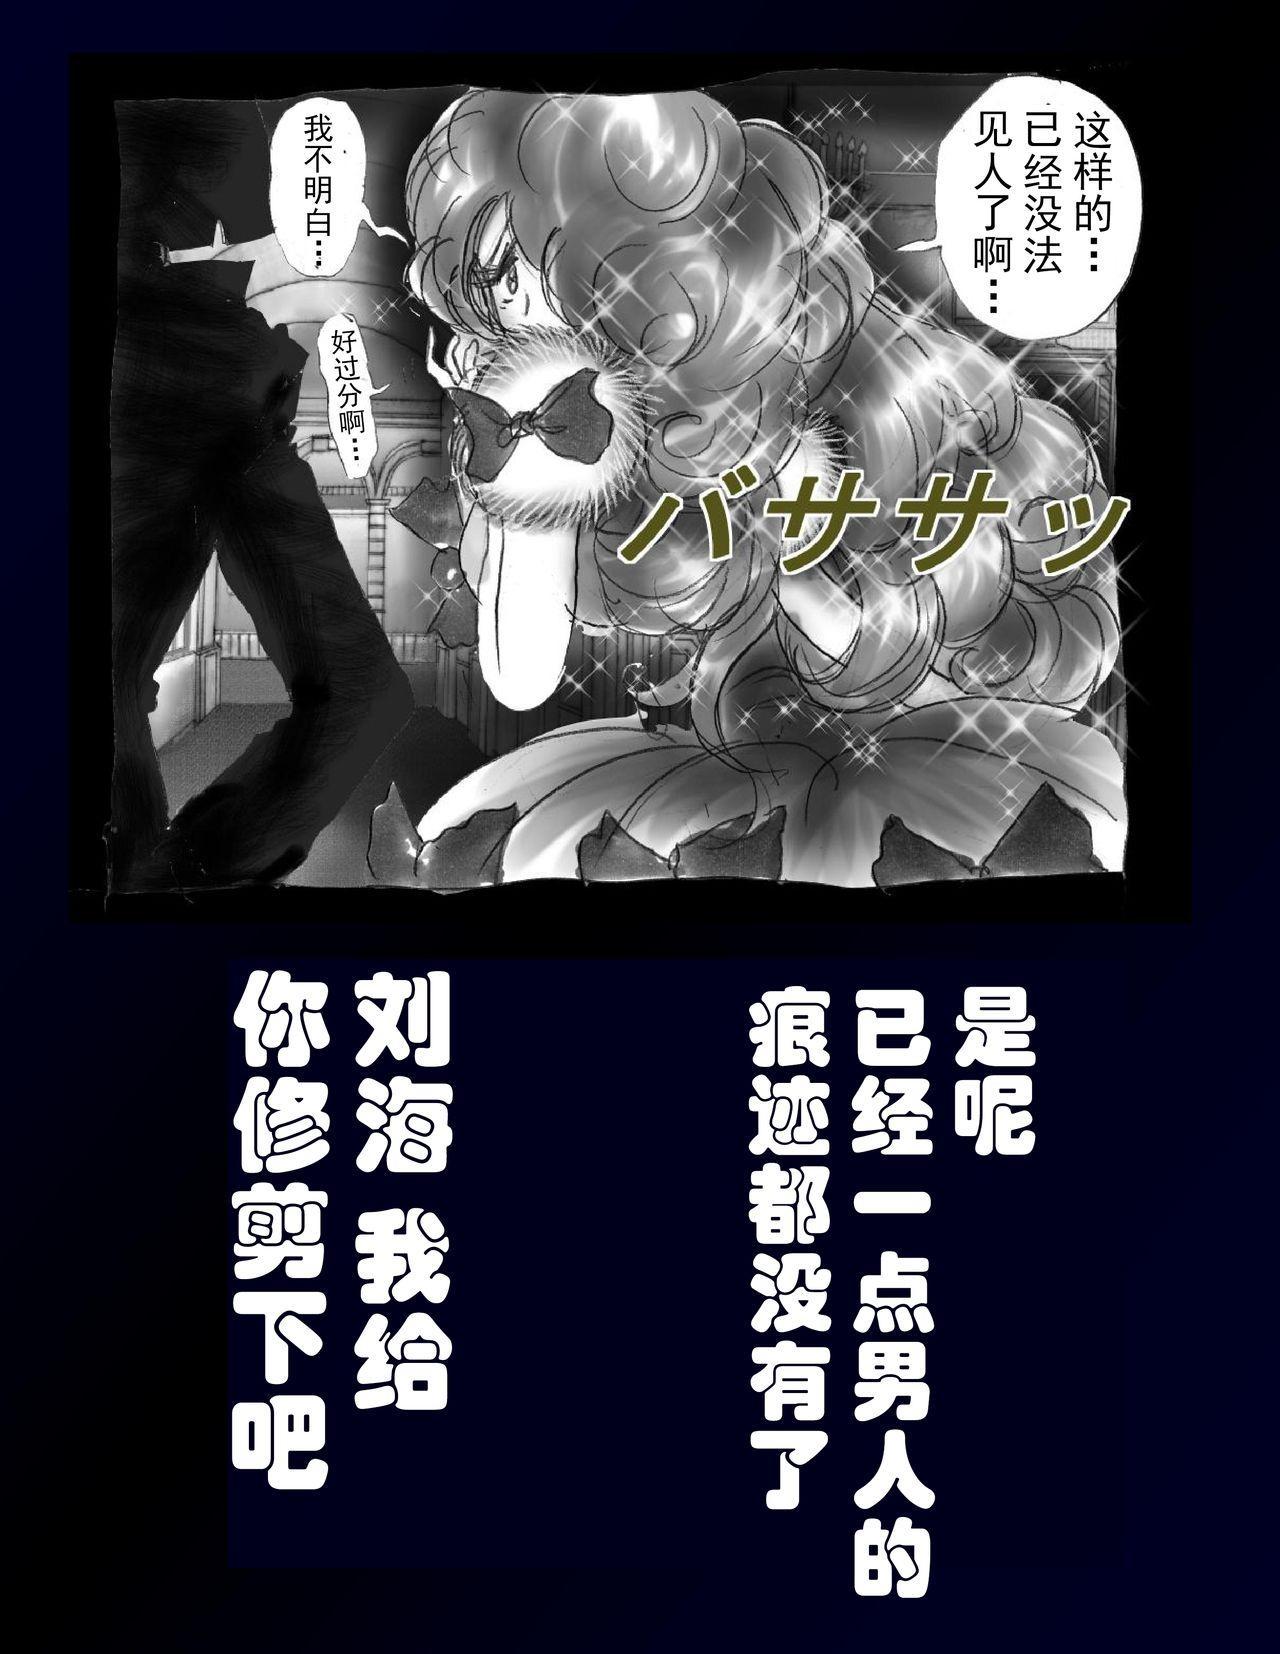 Kyousei Nyotaika Dress 62